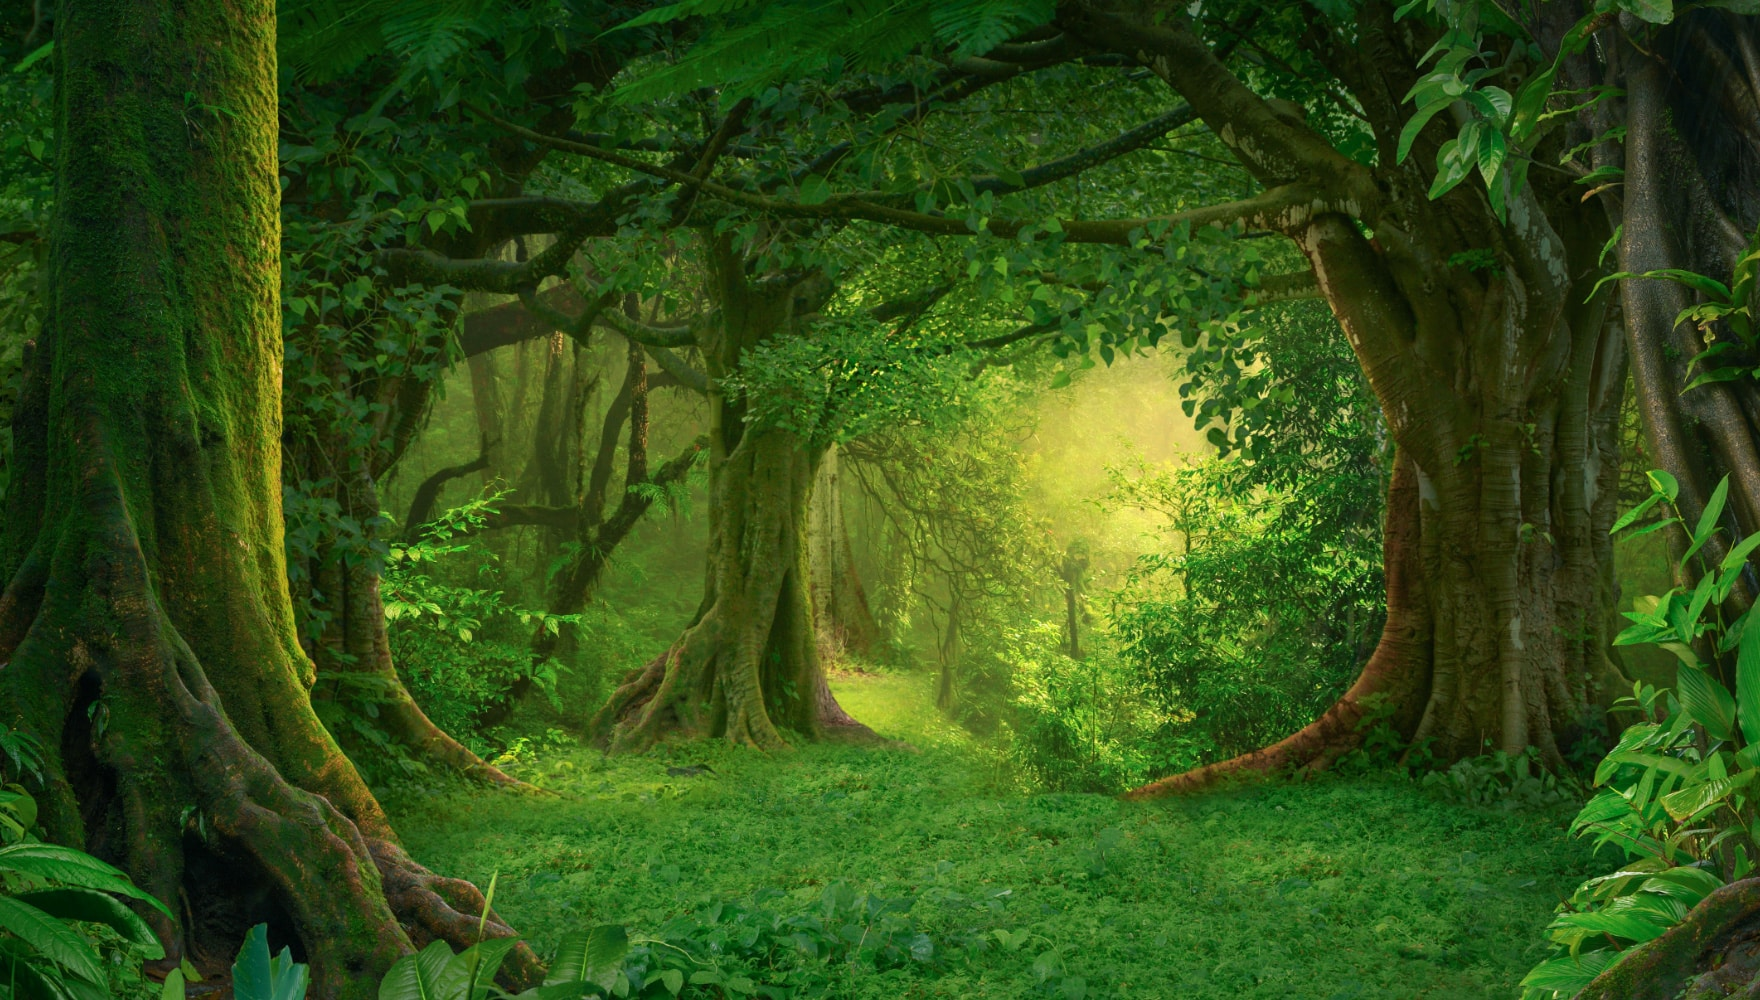 biophilia-forest